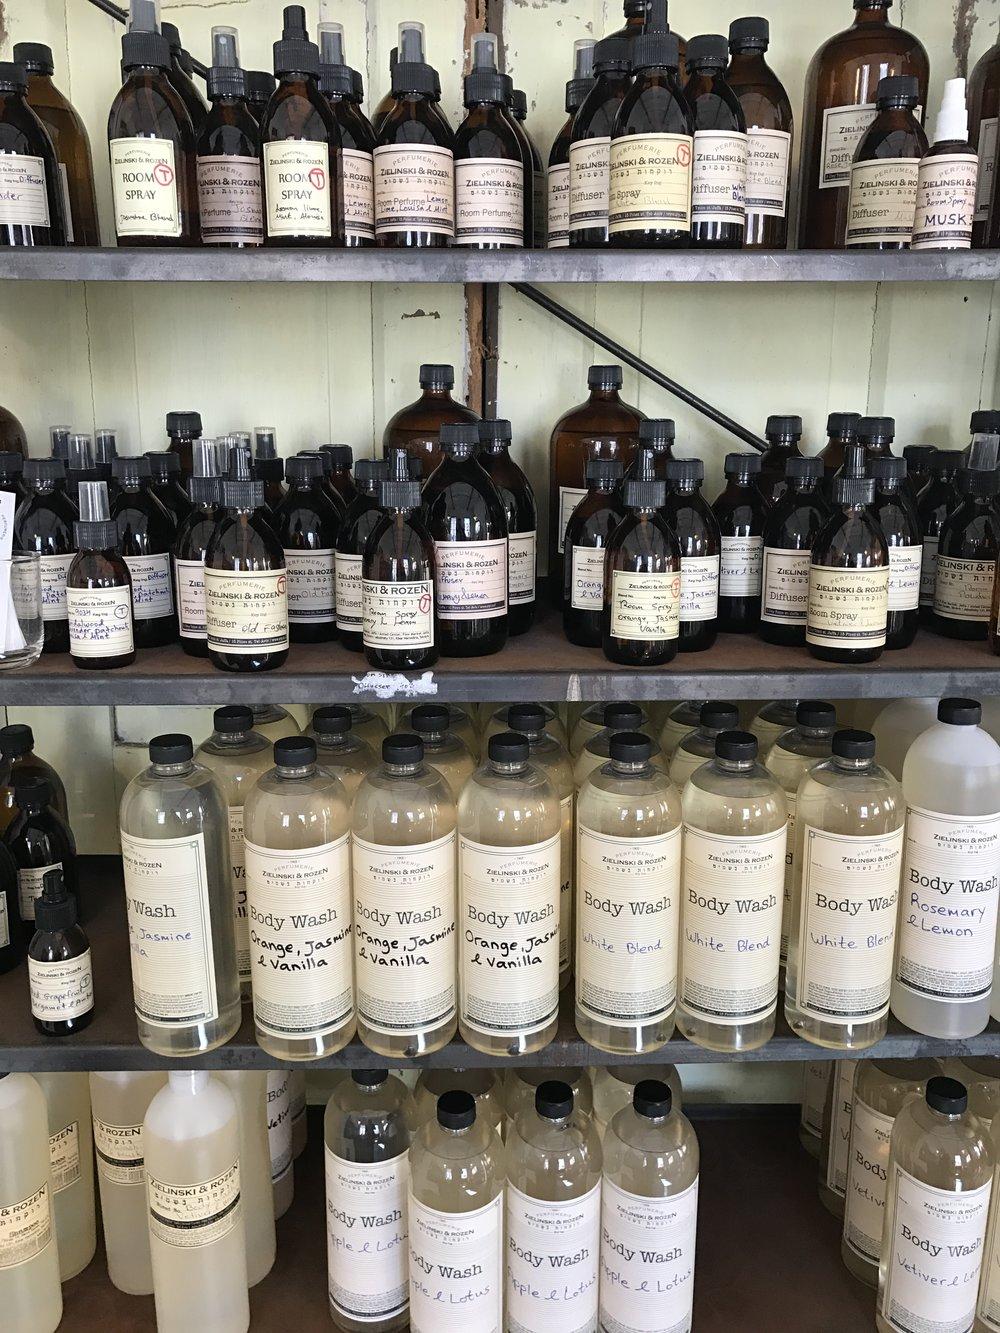 Zielinski and Rozen's unique scents